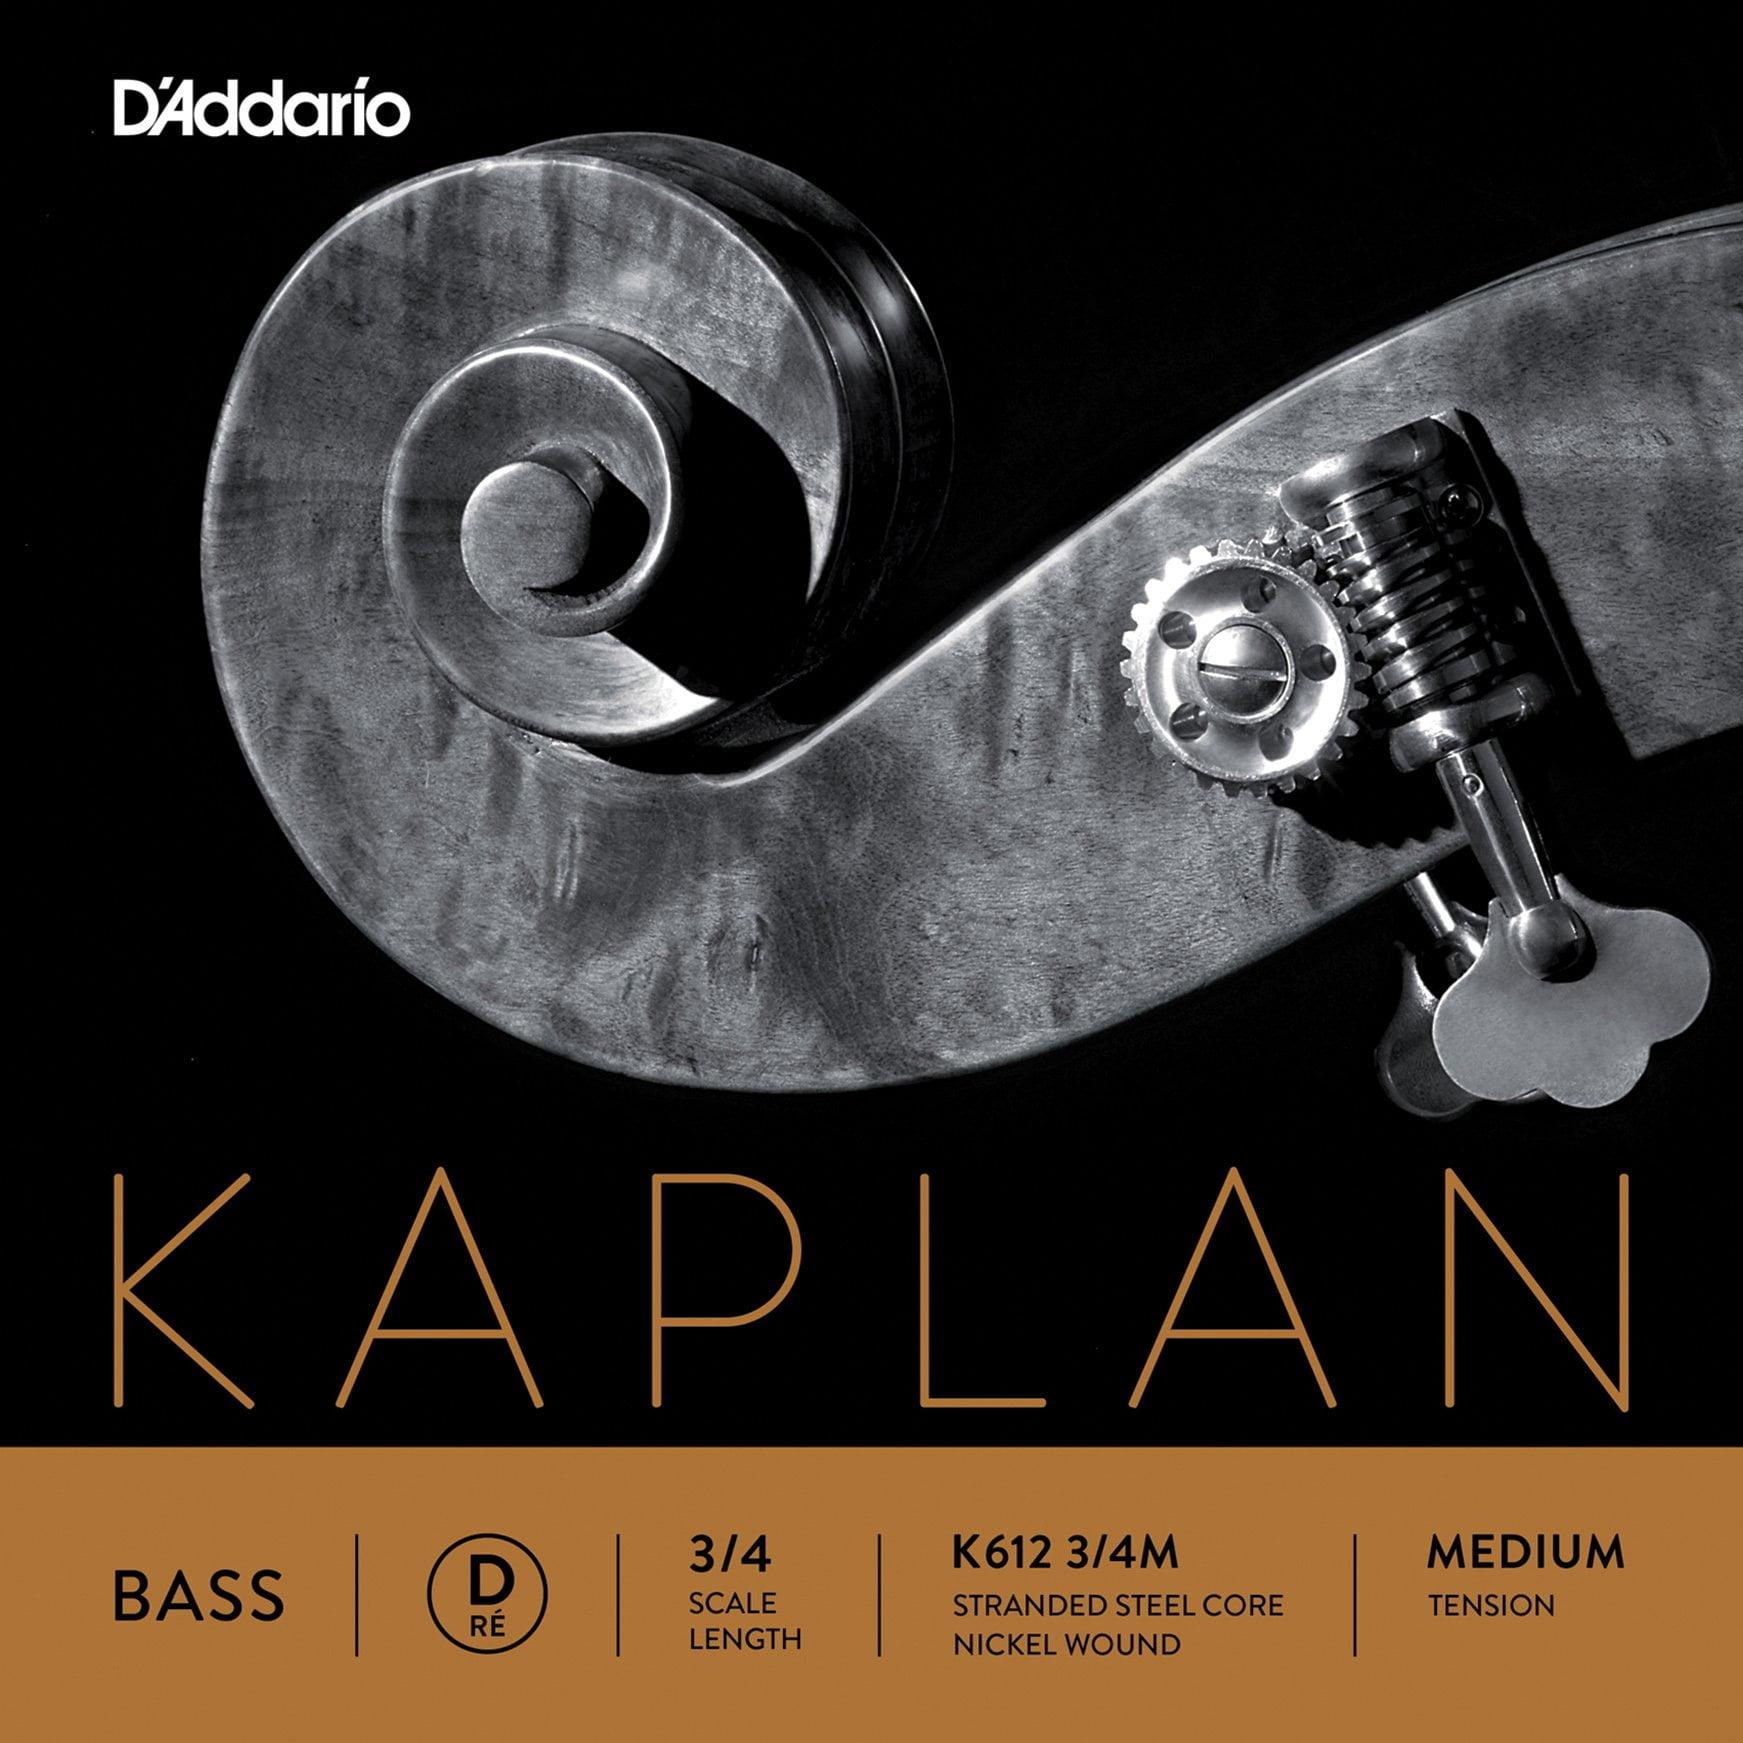 Kaplan Double Bass D String 3/4 Medium